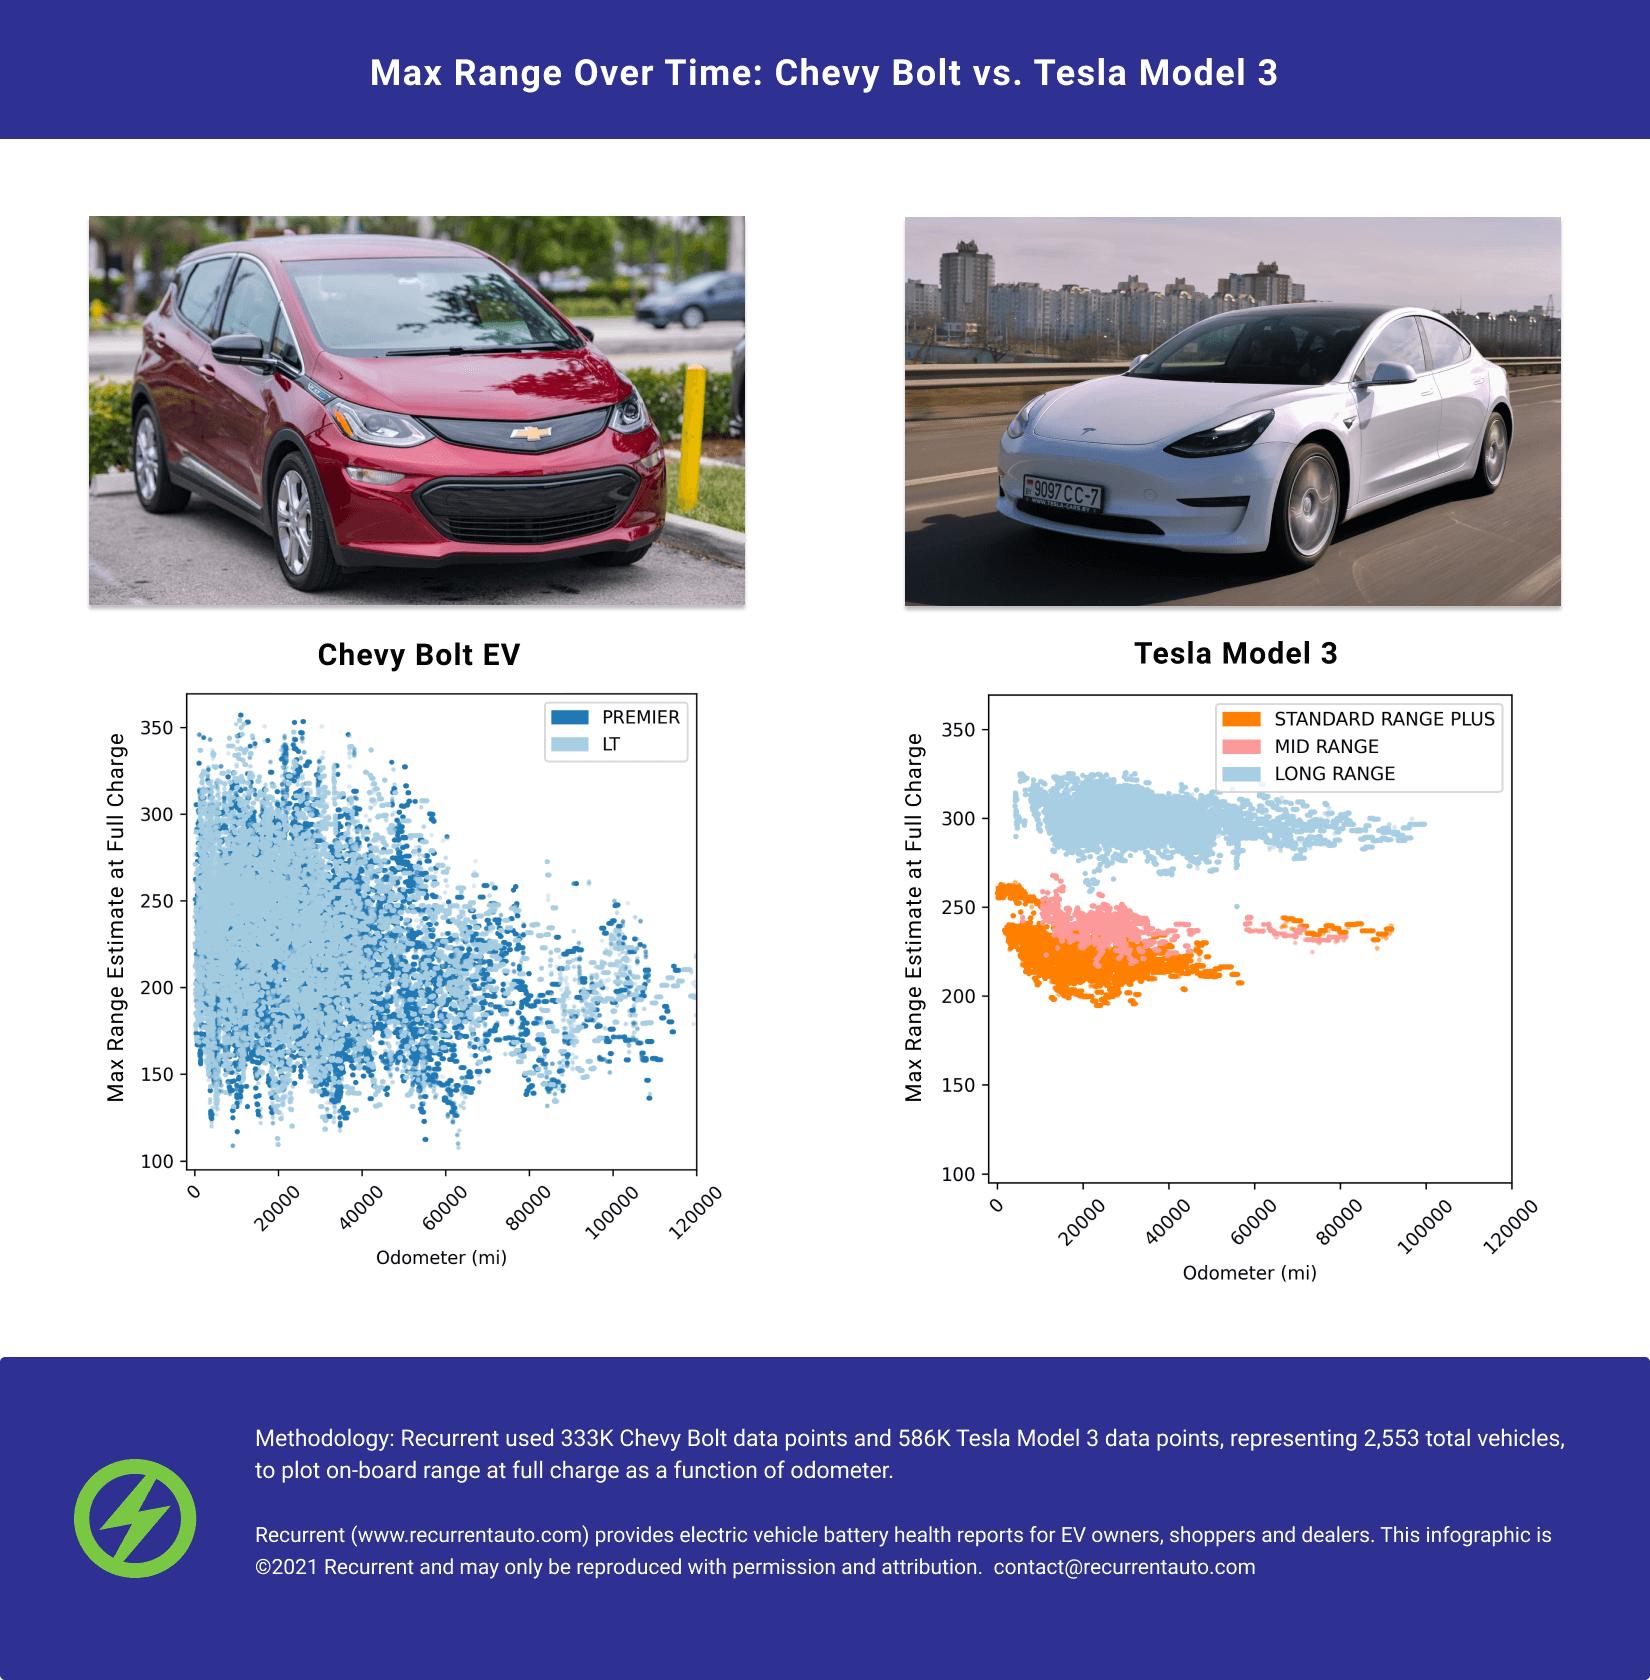 Comparing Tesla Model 3 vs Chevy Bolt Range